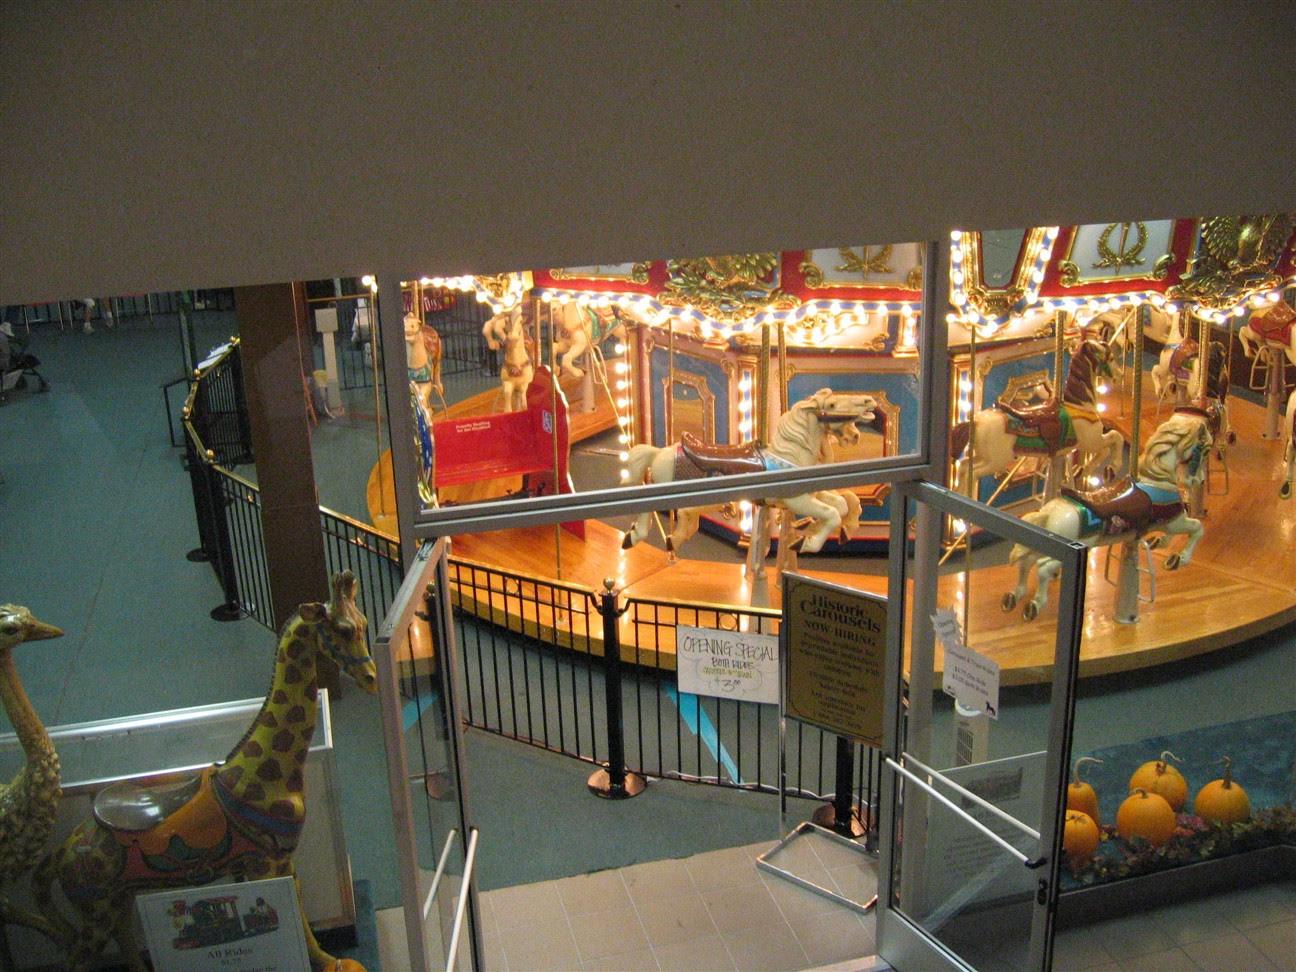 Vancouver Mall; Vancouver, Washington | Labelscar